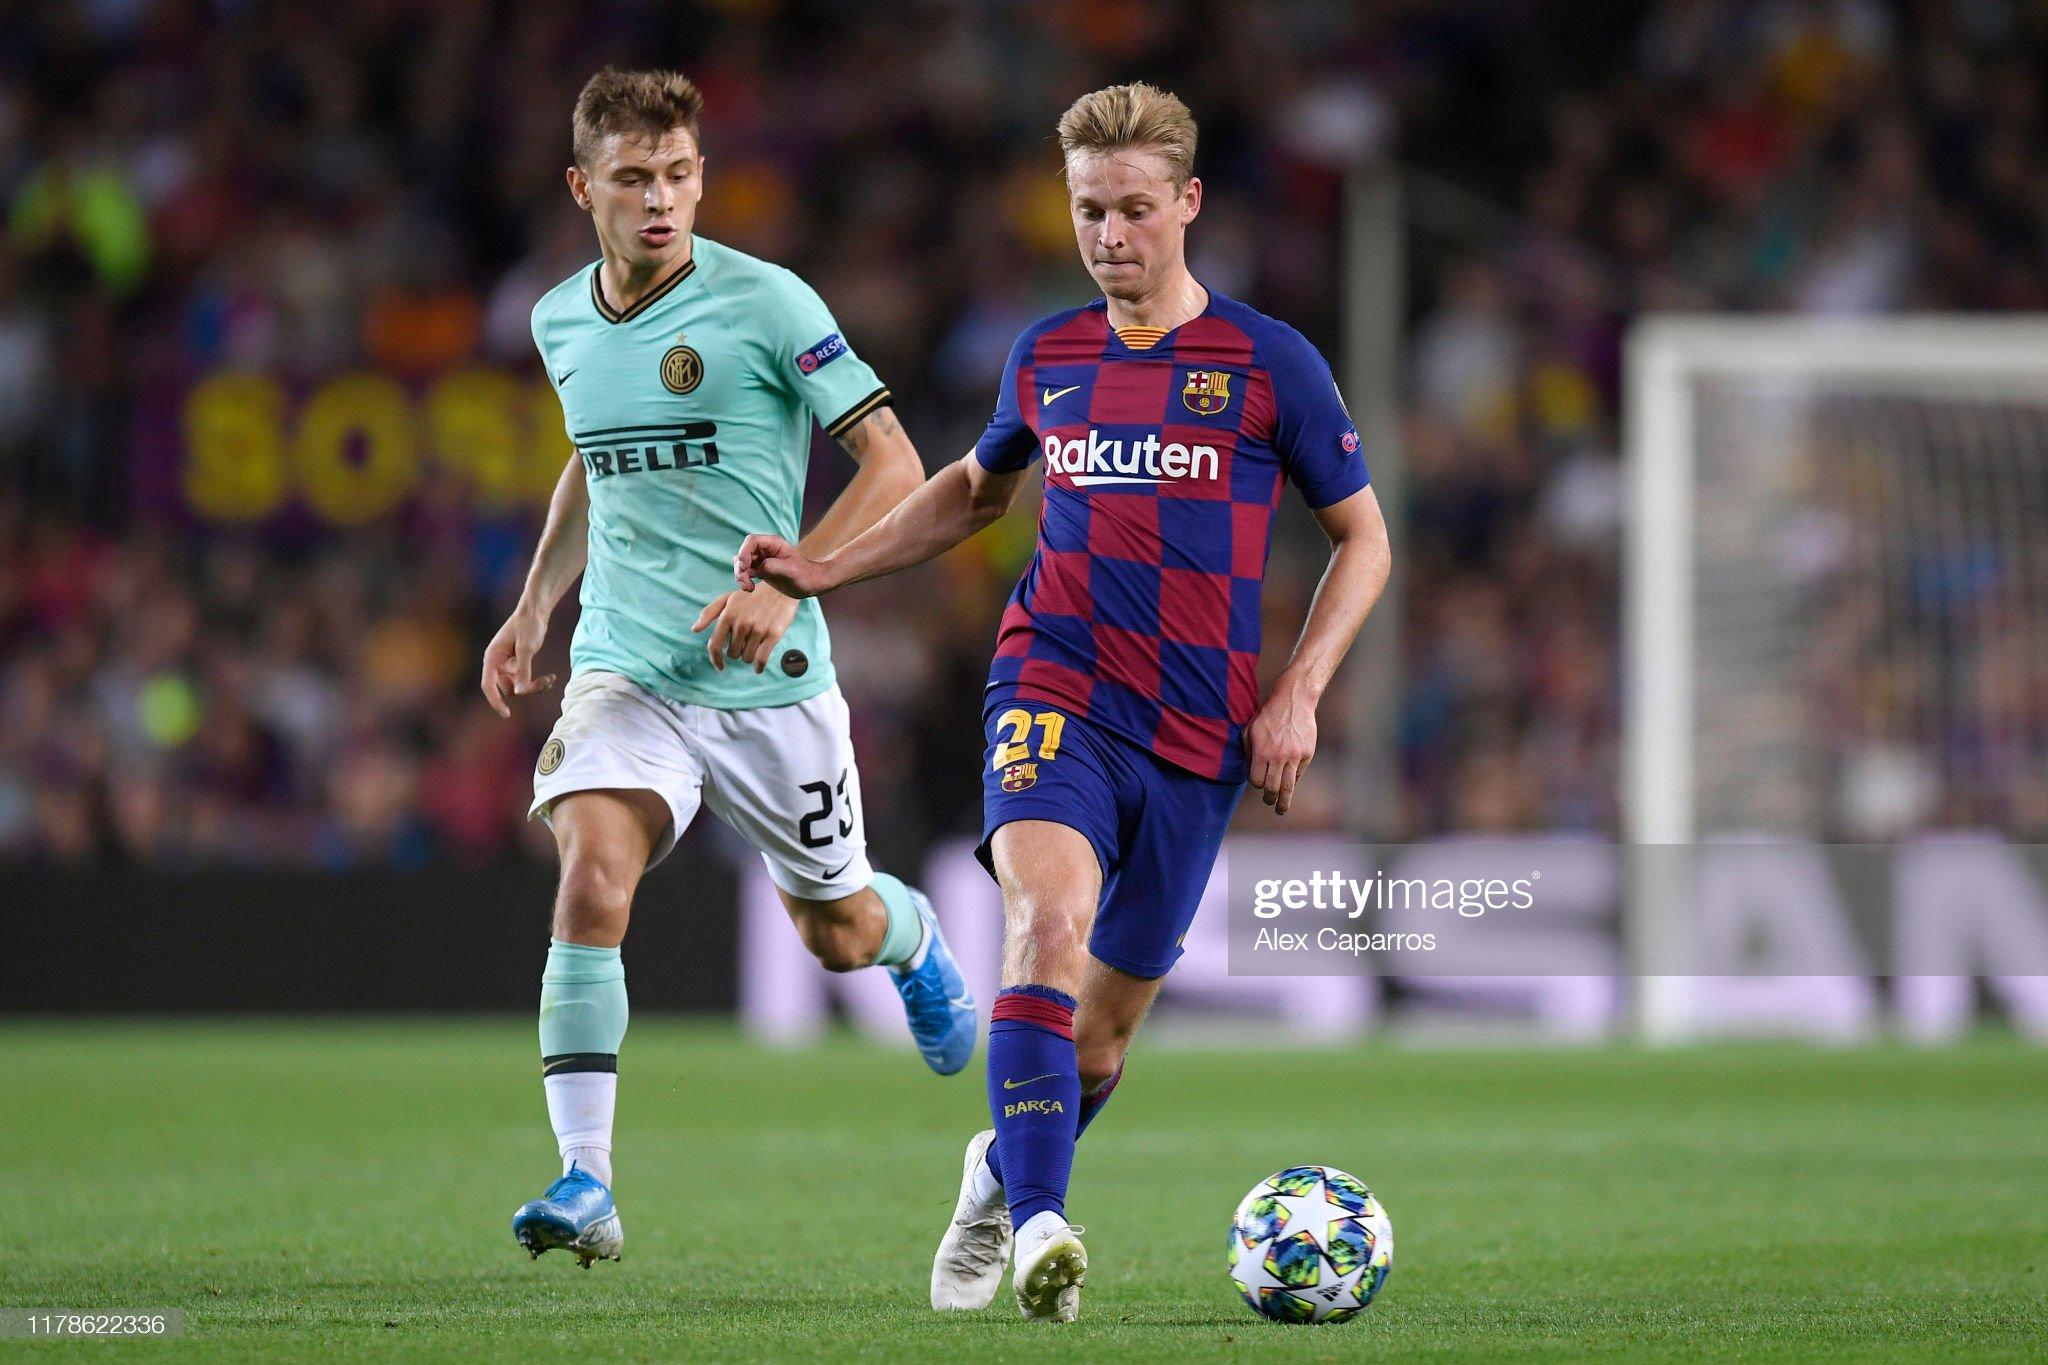 صور مباراة : برشلونة - إنتر 2-1 ( 02-10-2019 )  Frenkie-de-jong-of-fc-barcelona-is-closed-down-by-nicolo-barella-of-picture-id1178622336?s=2048x2048